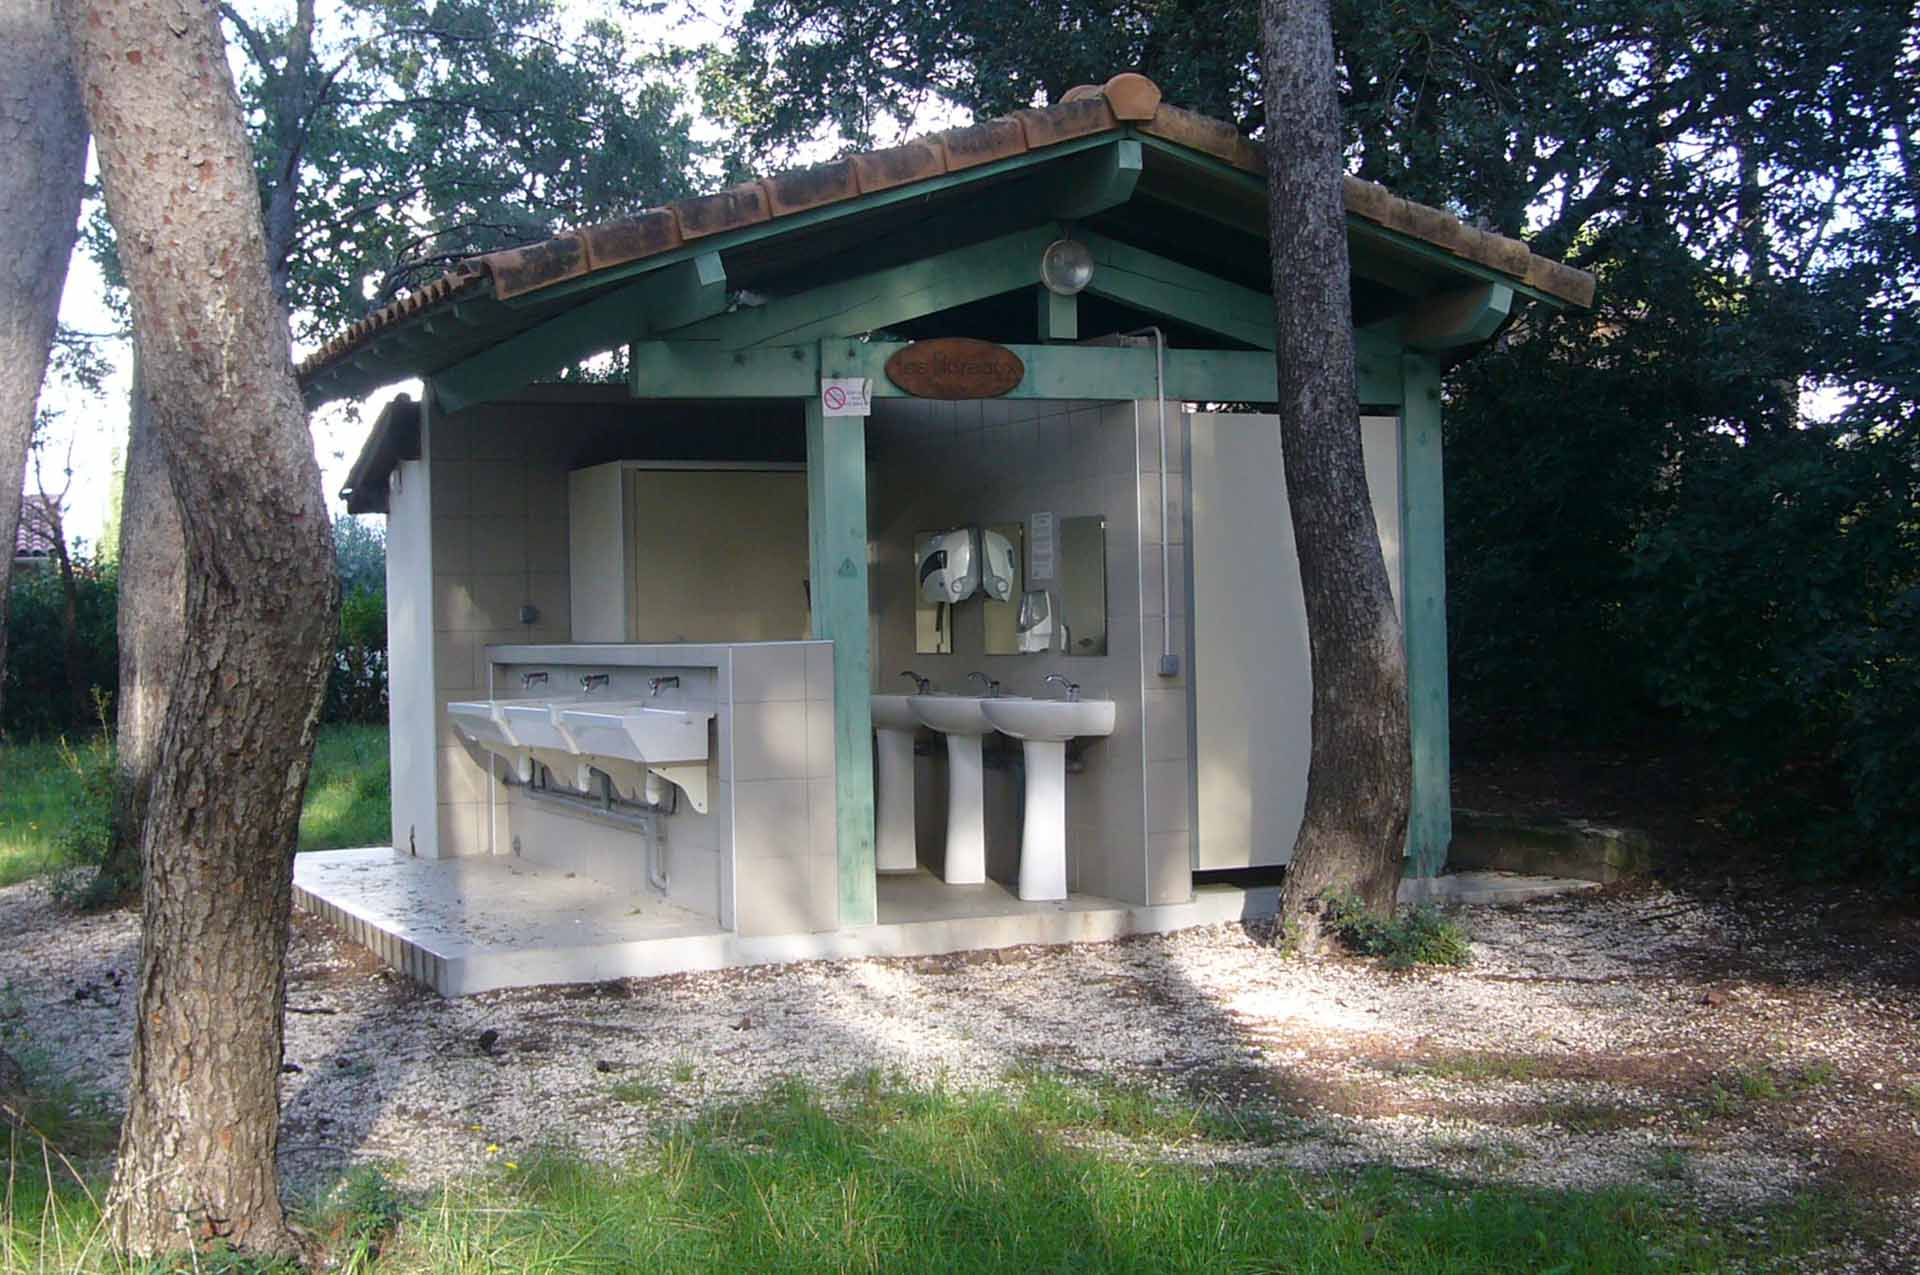 Sanitaire camping